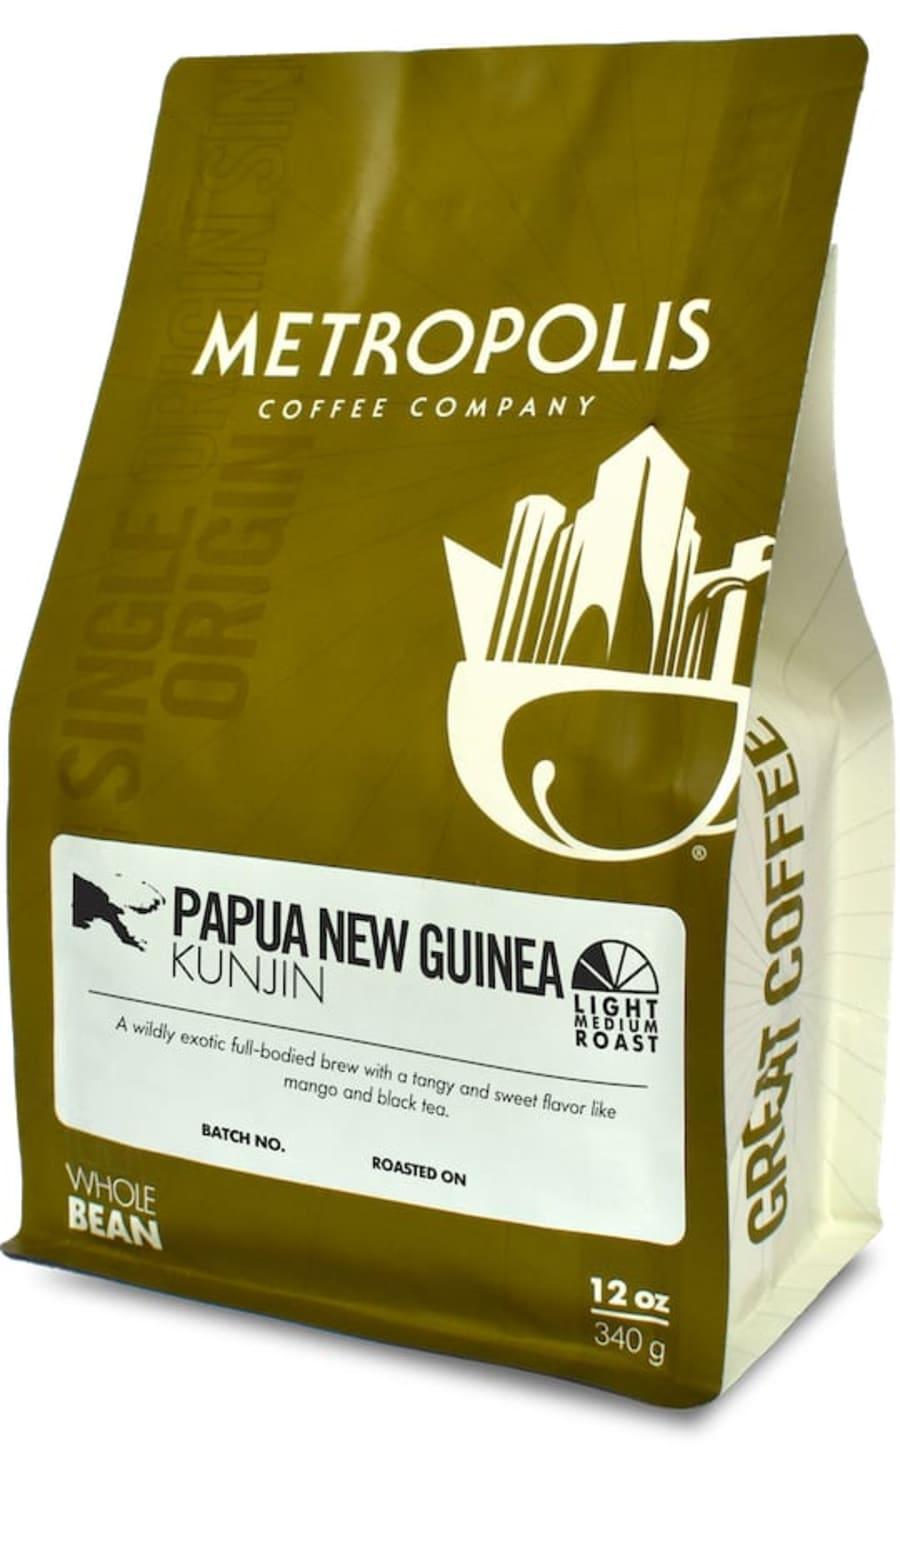 Papua New Guinea Kunjin | Metropolis Coffee